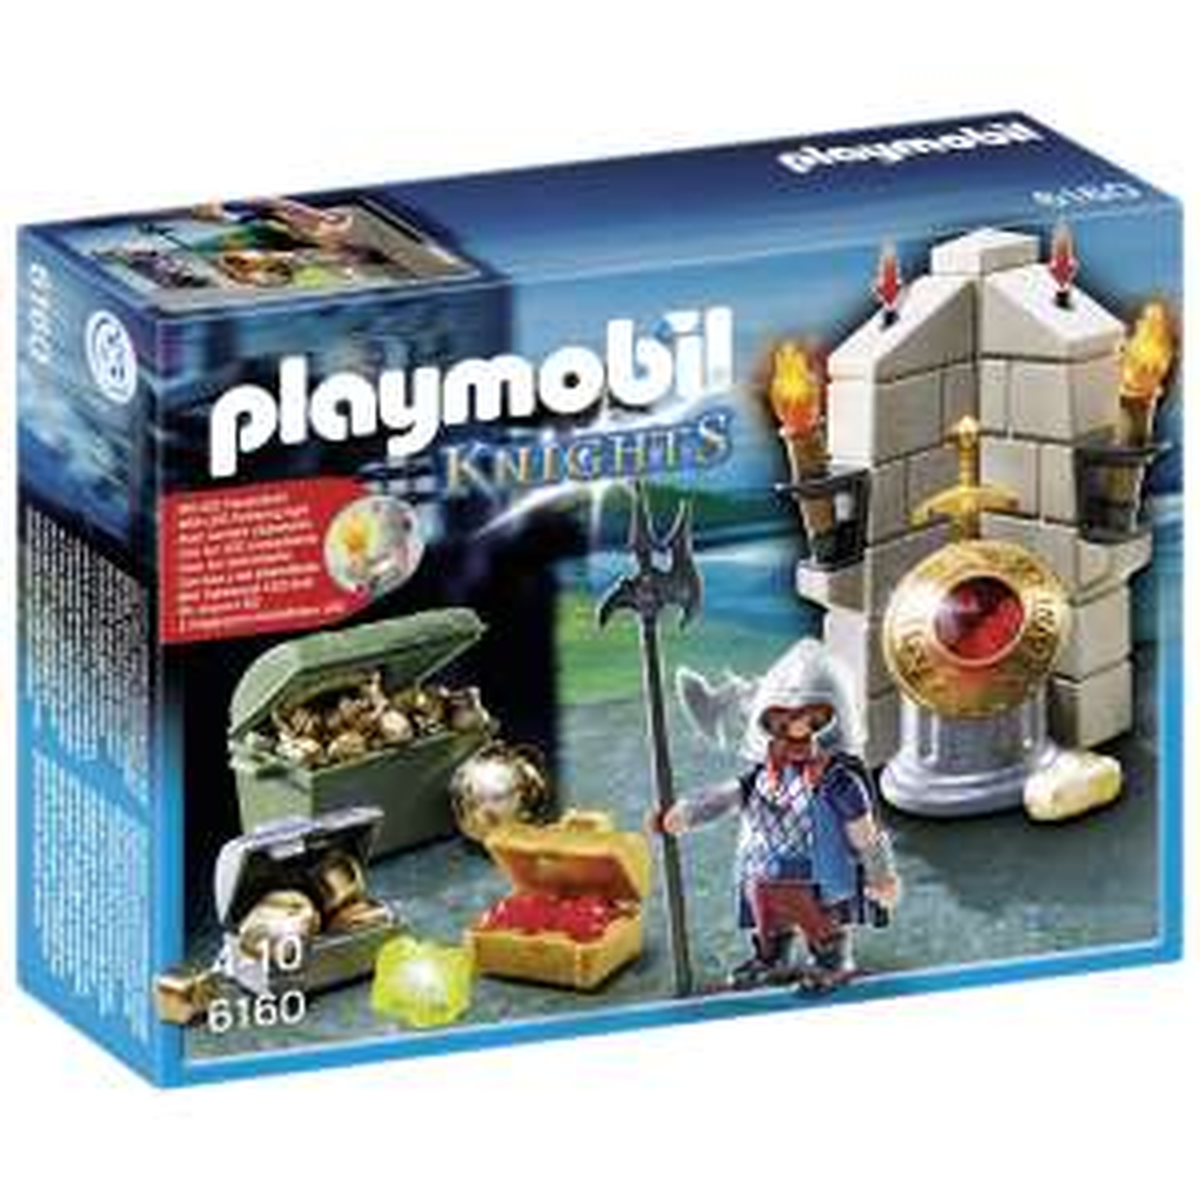 Playmobil™ - Knights: Wächter des Königsschatzes (6160) ab €5,64 [@Karstadt.de]